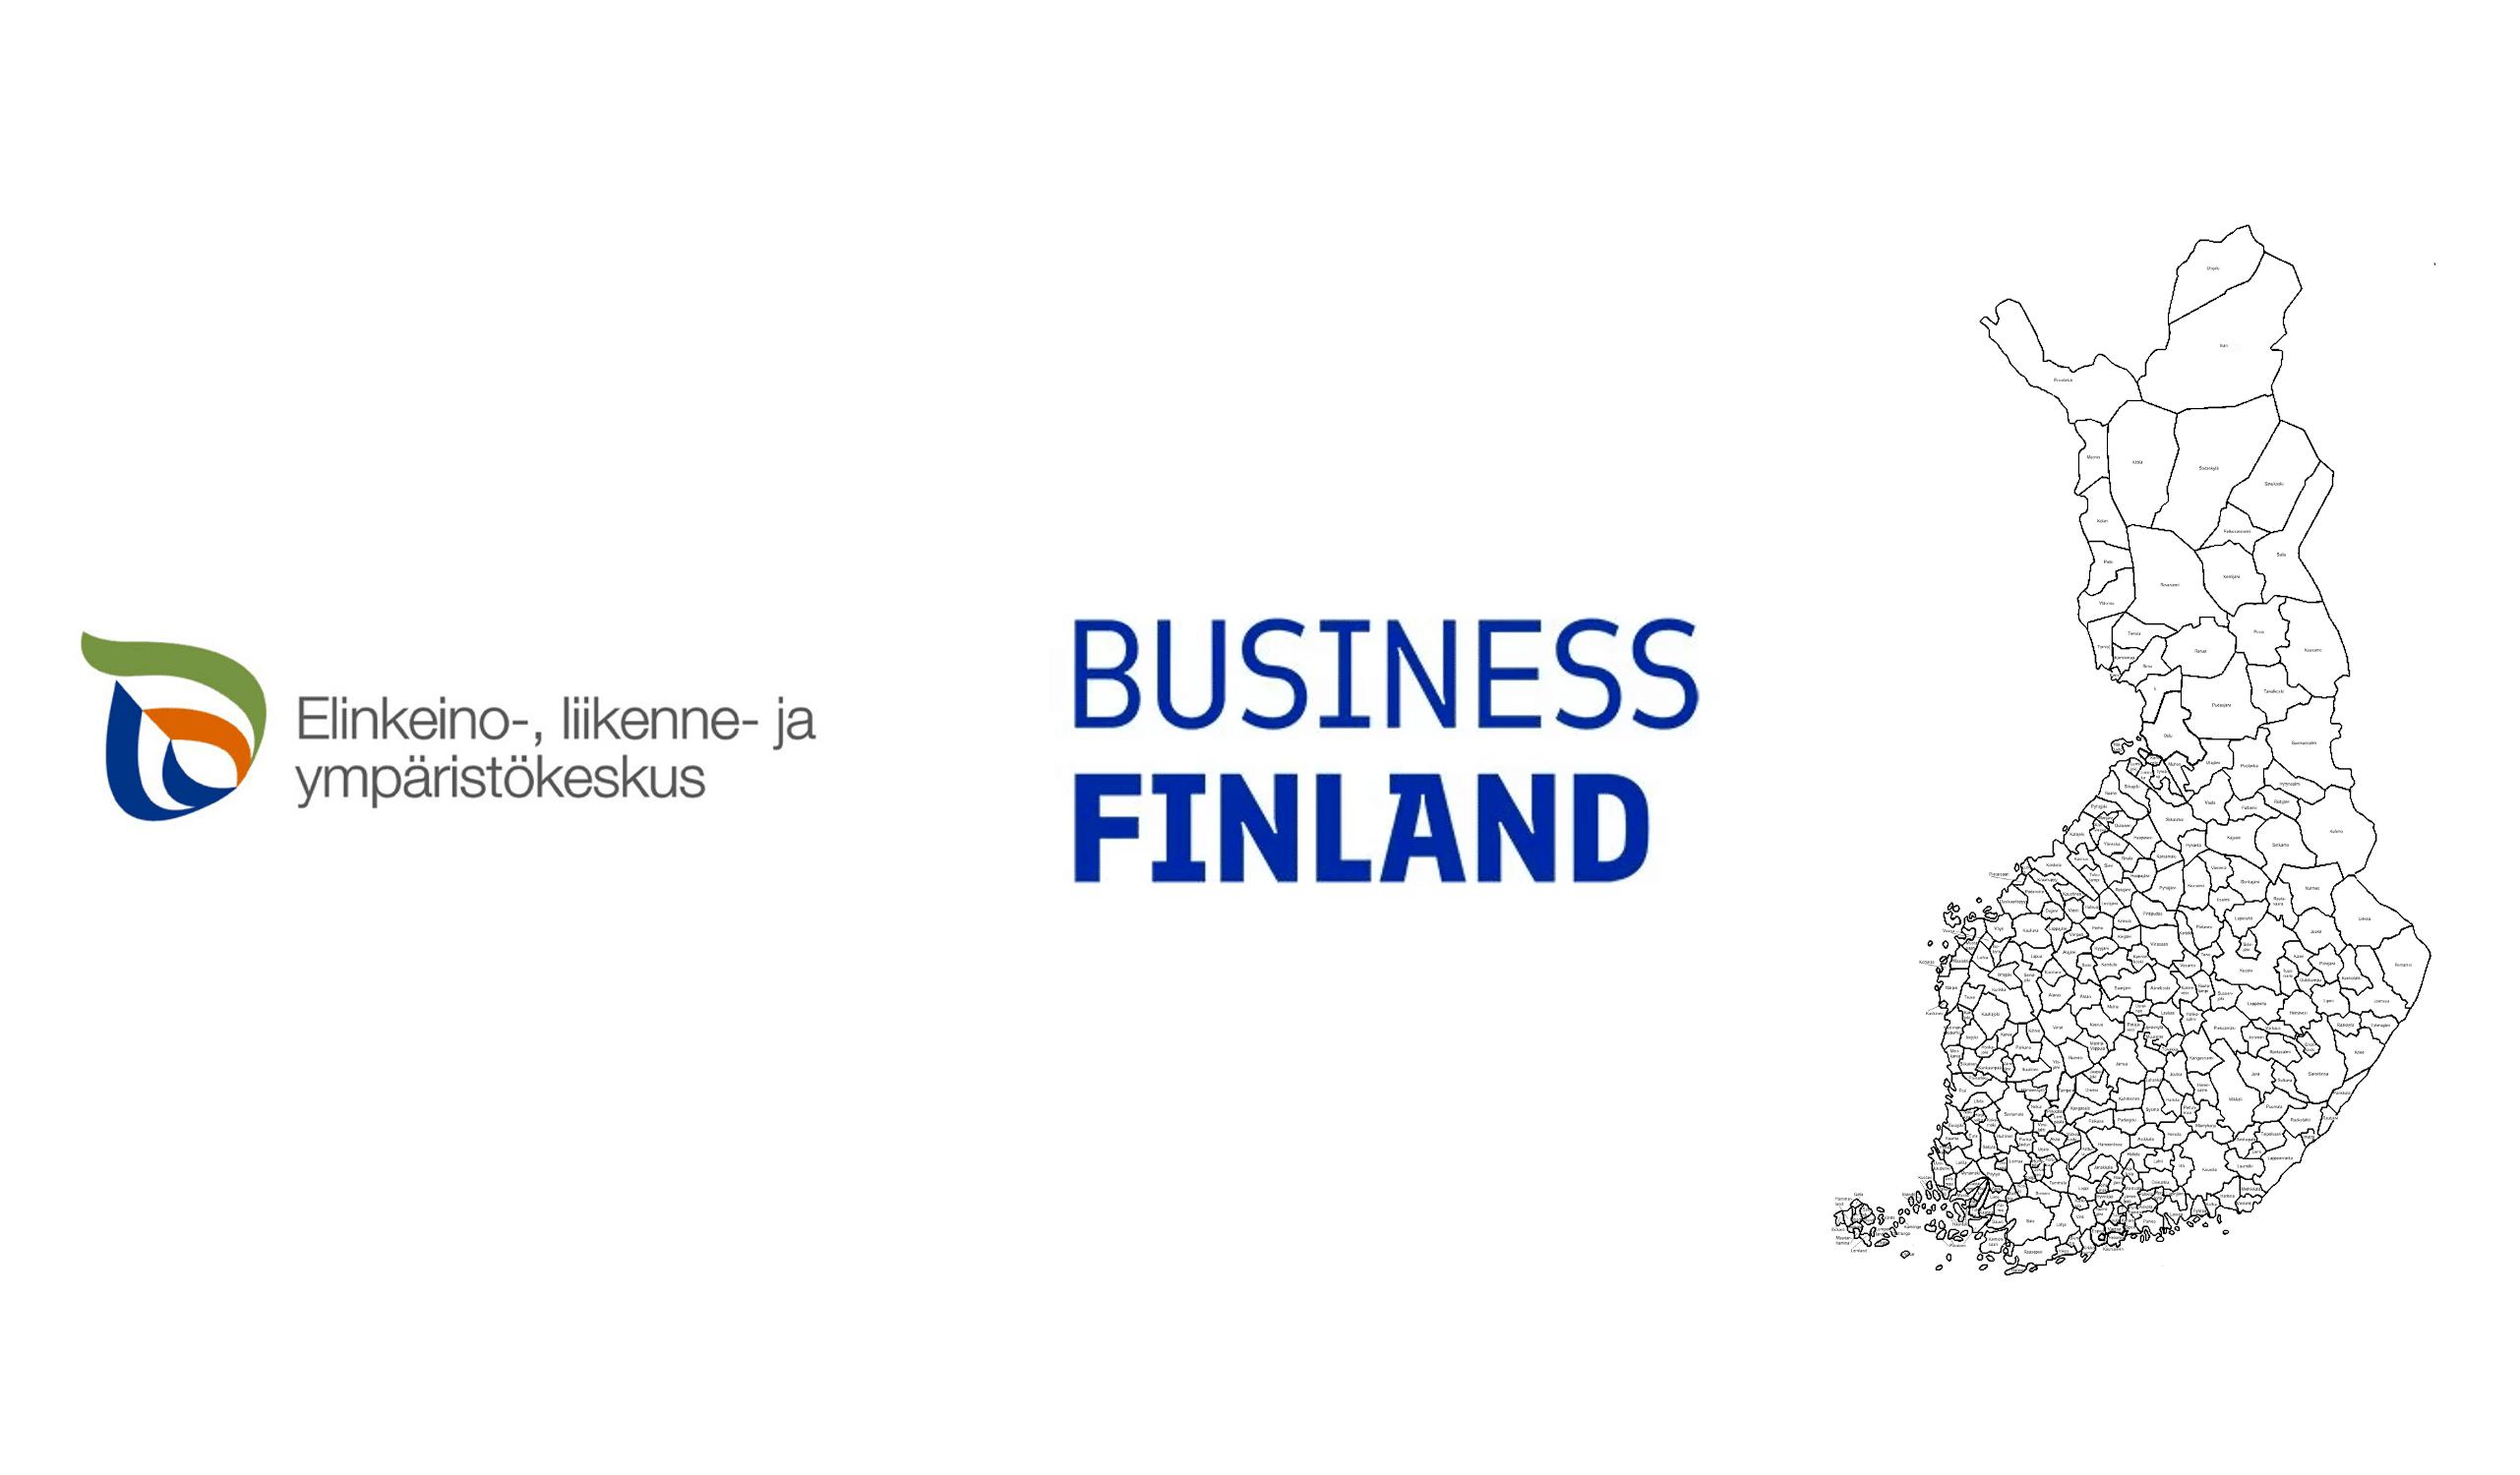 Ely-keskus tuet, Business Finland -tuet, kuntien korona-tuet